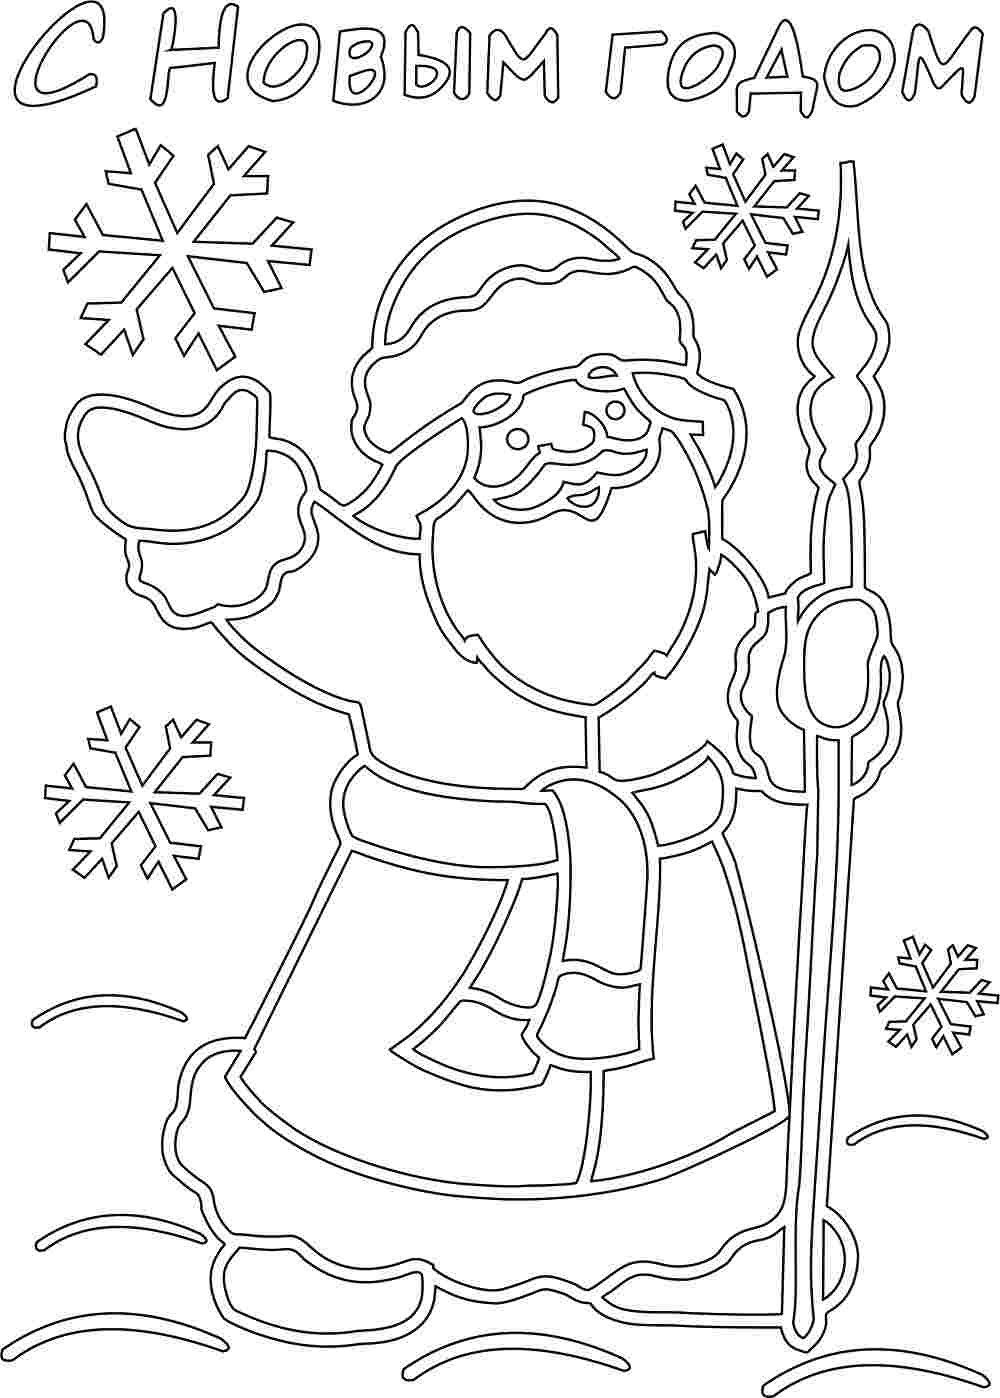 Шаблоны для нового года на окна дед мороз